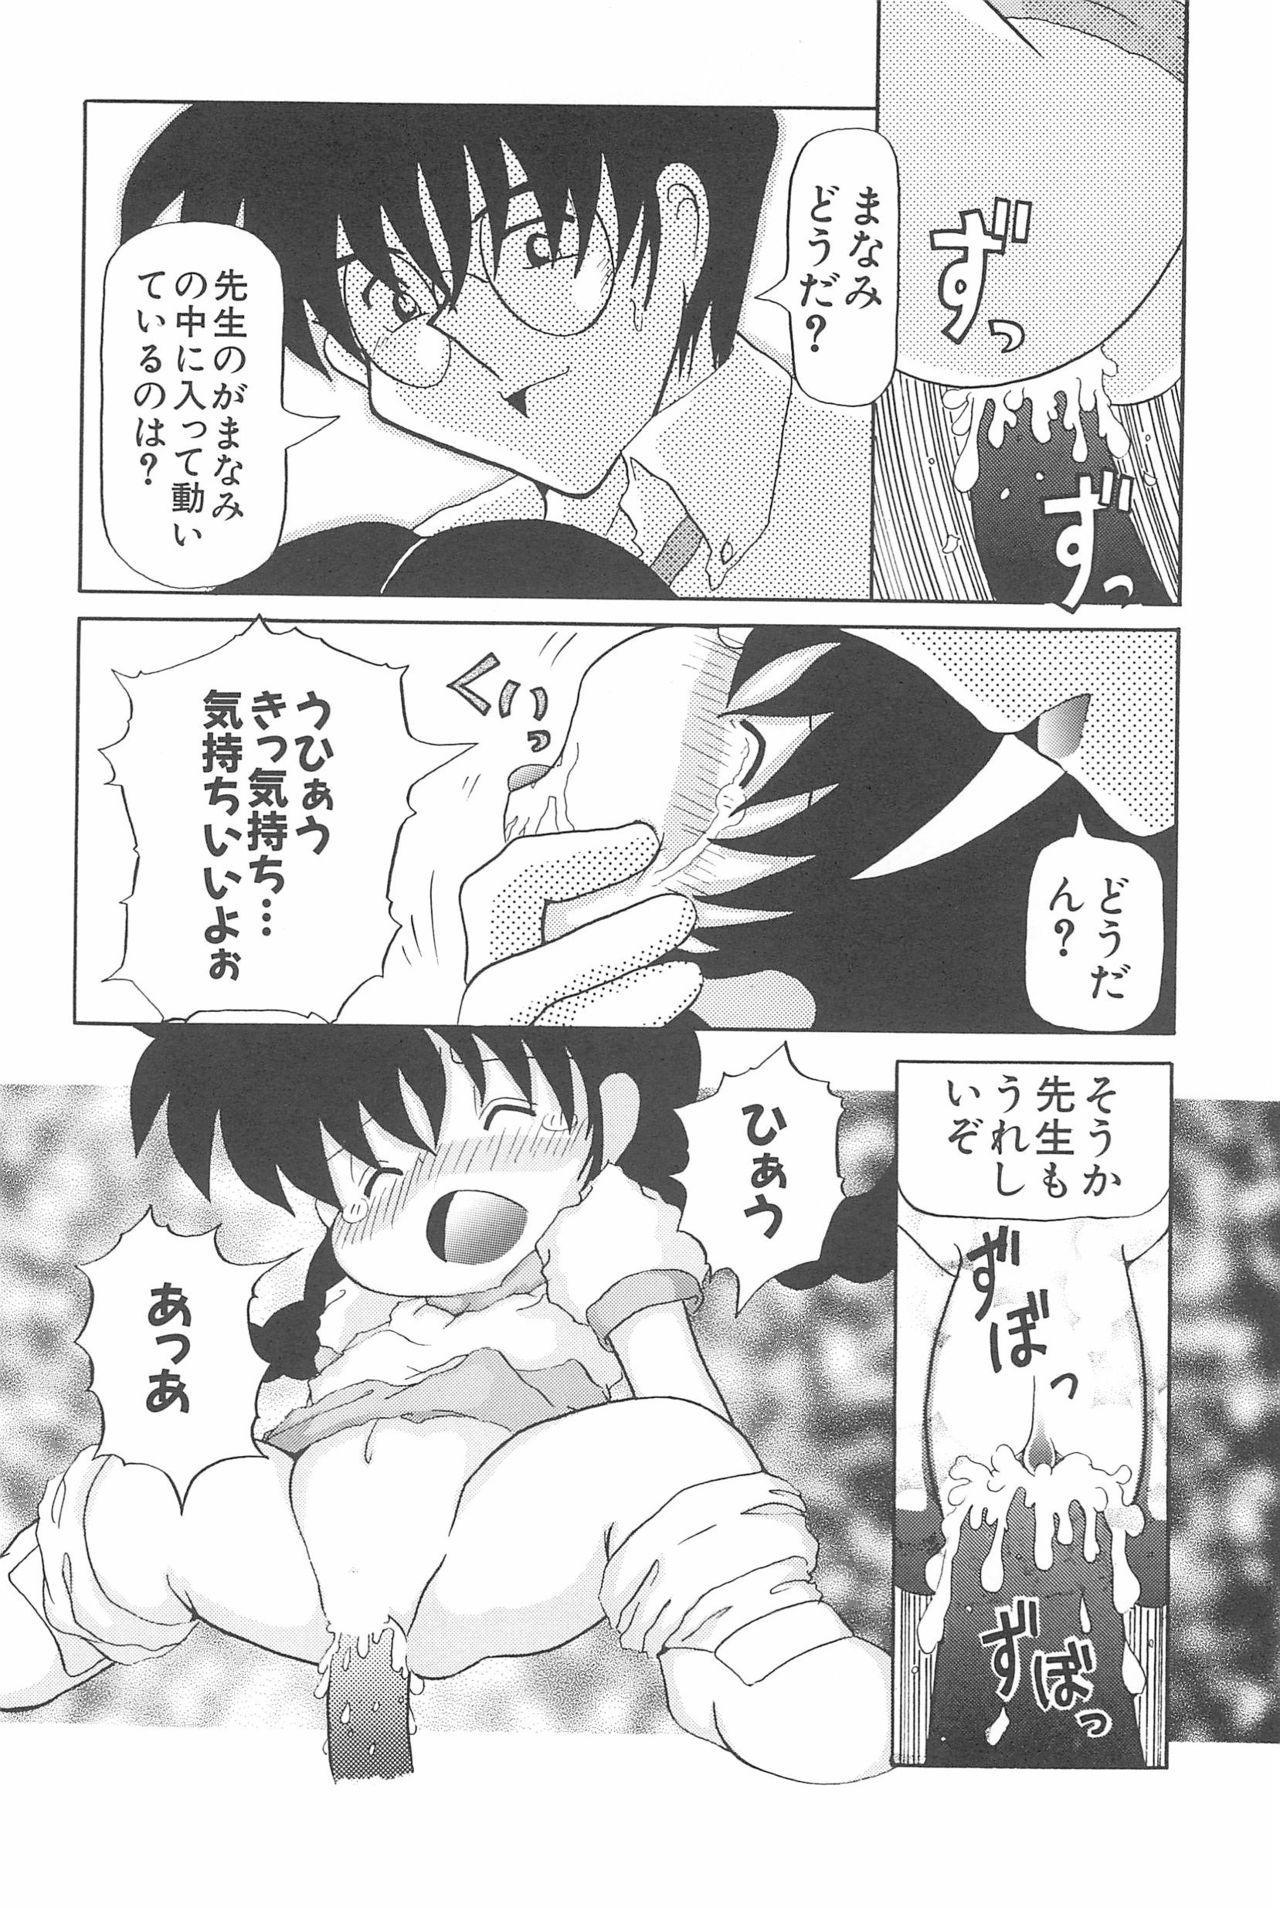 Aoi Shojokyuu 107